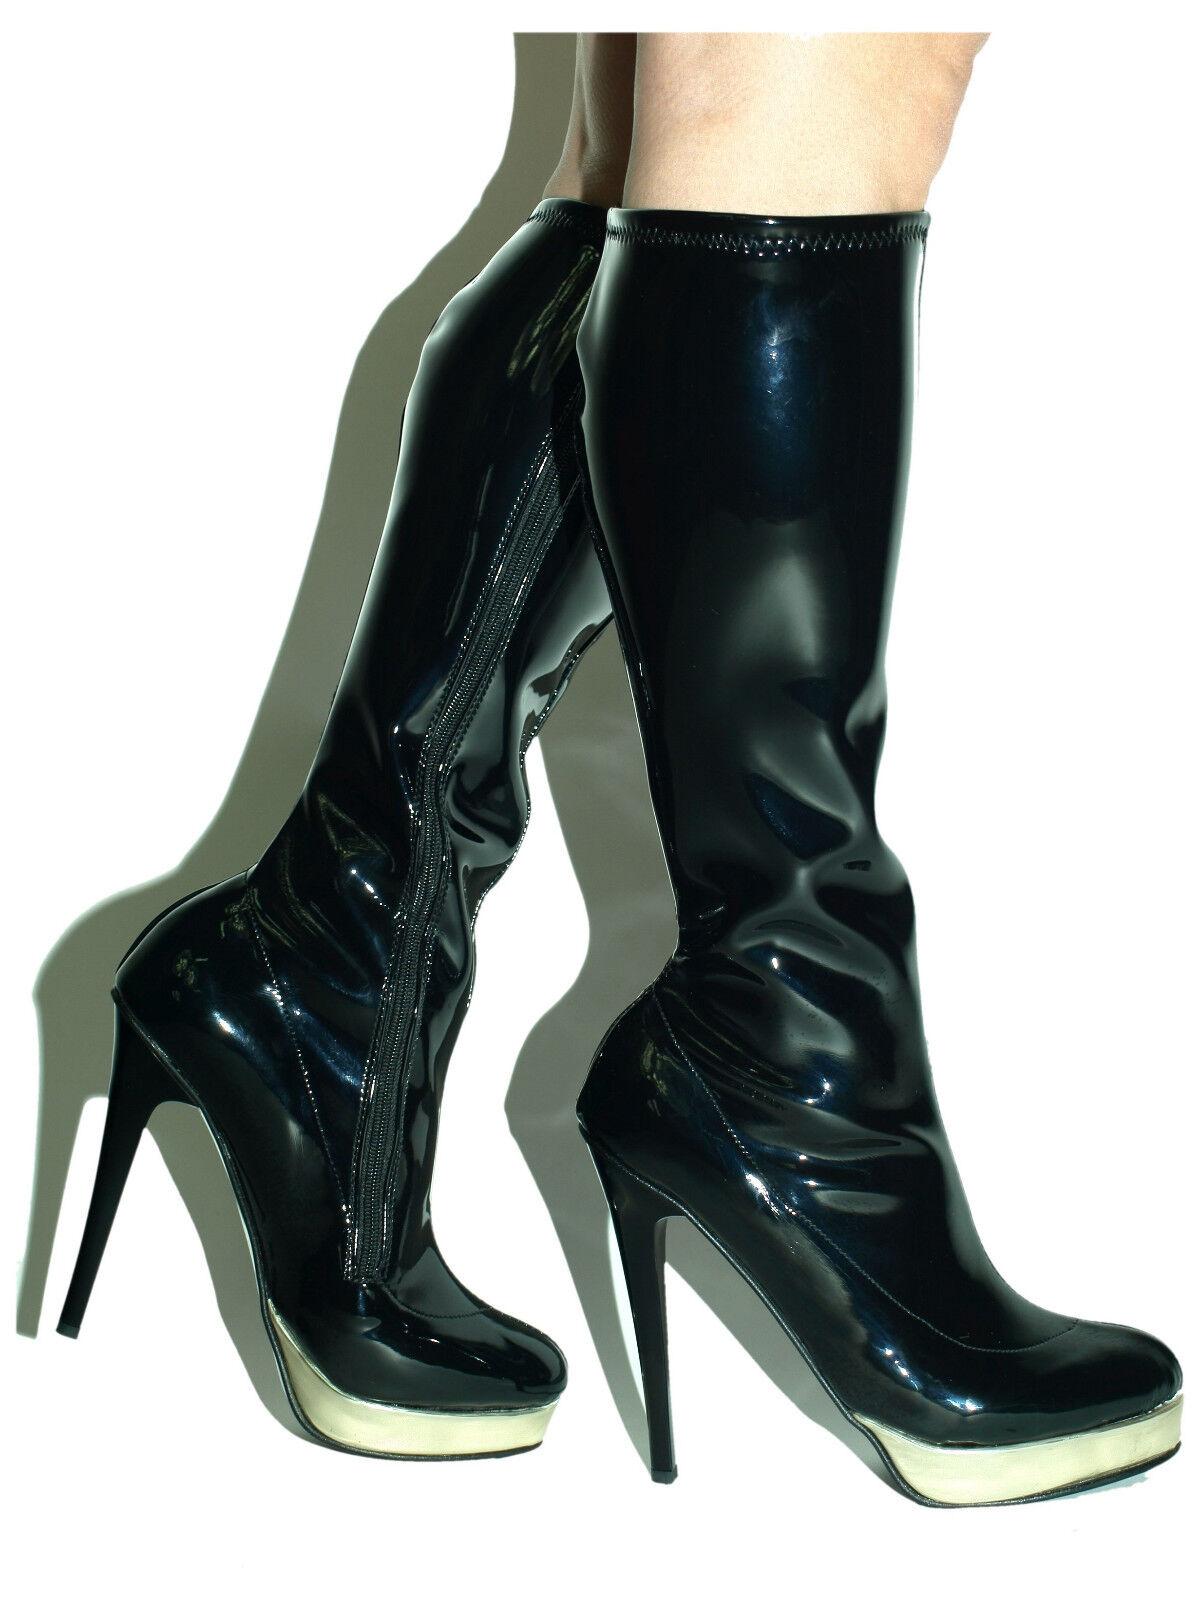 High heels, stiefel Lack Stretch  -Größe 37-47 producer -Polen Bolingier